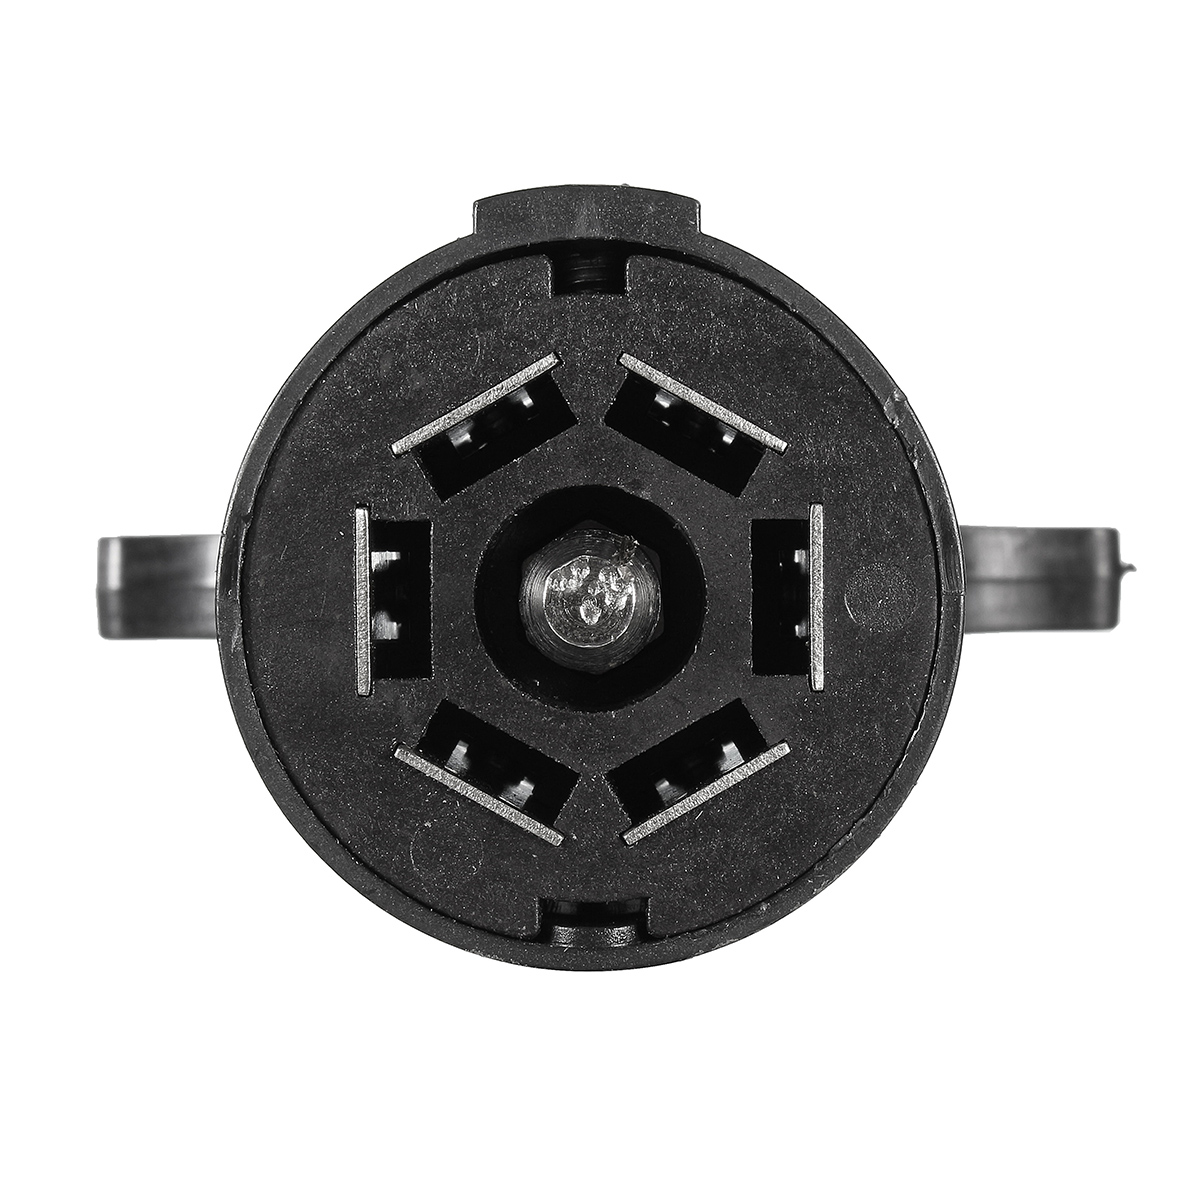 trailer connector 1995 jeep wrangler parts diagram black round 7 poles rv male light plug